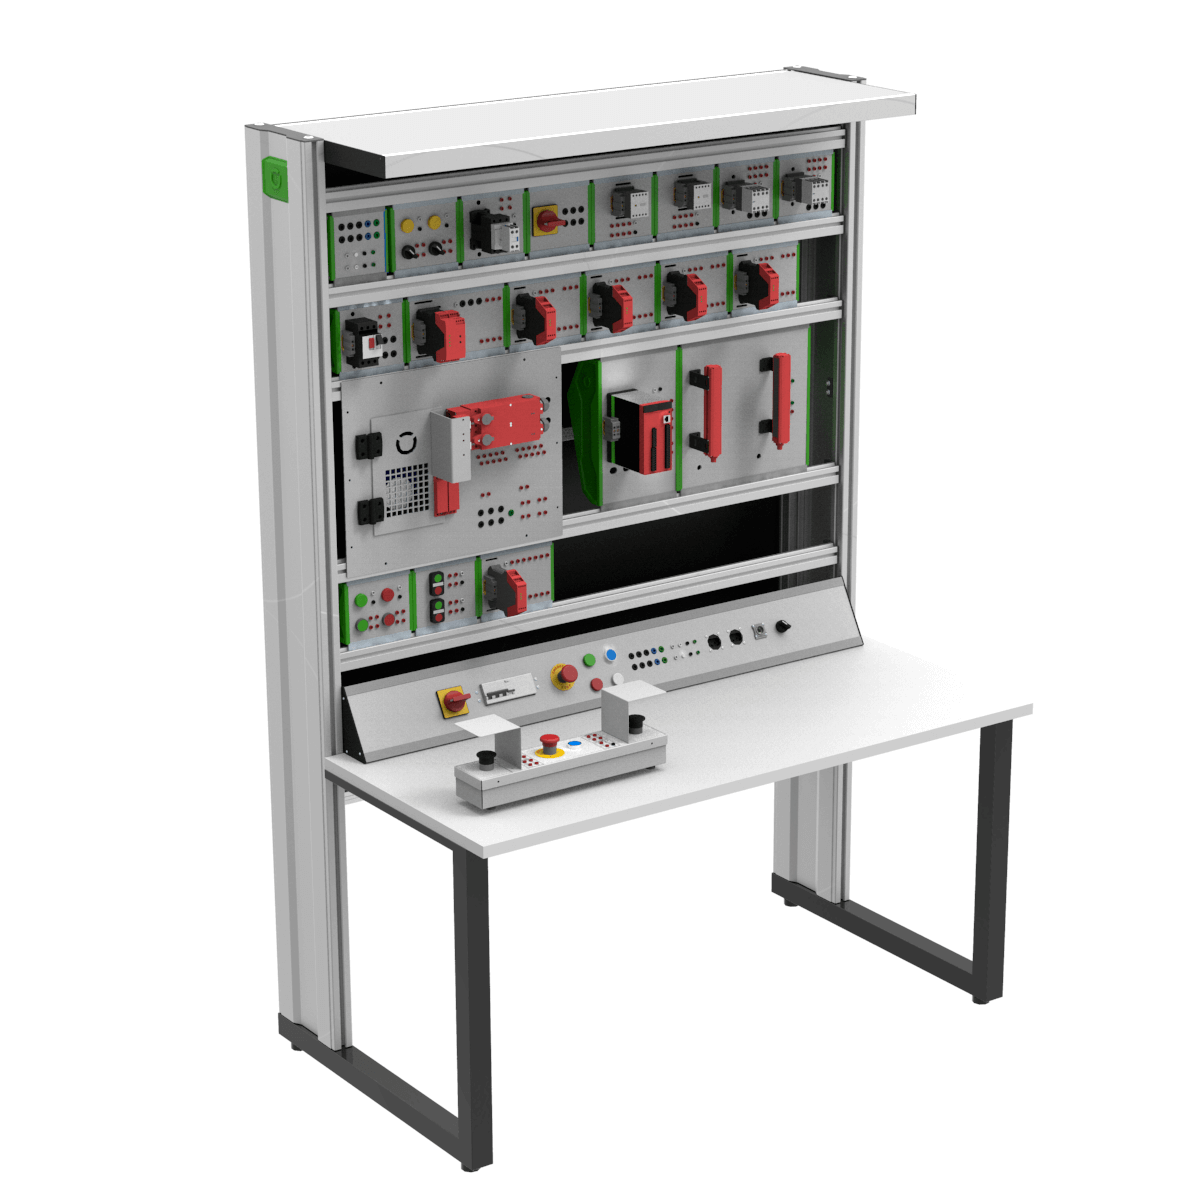 lab-eletricidade-industrial-bancada-didatica-seguranca-industrial-nr12_1-auttom-2